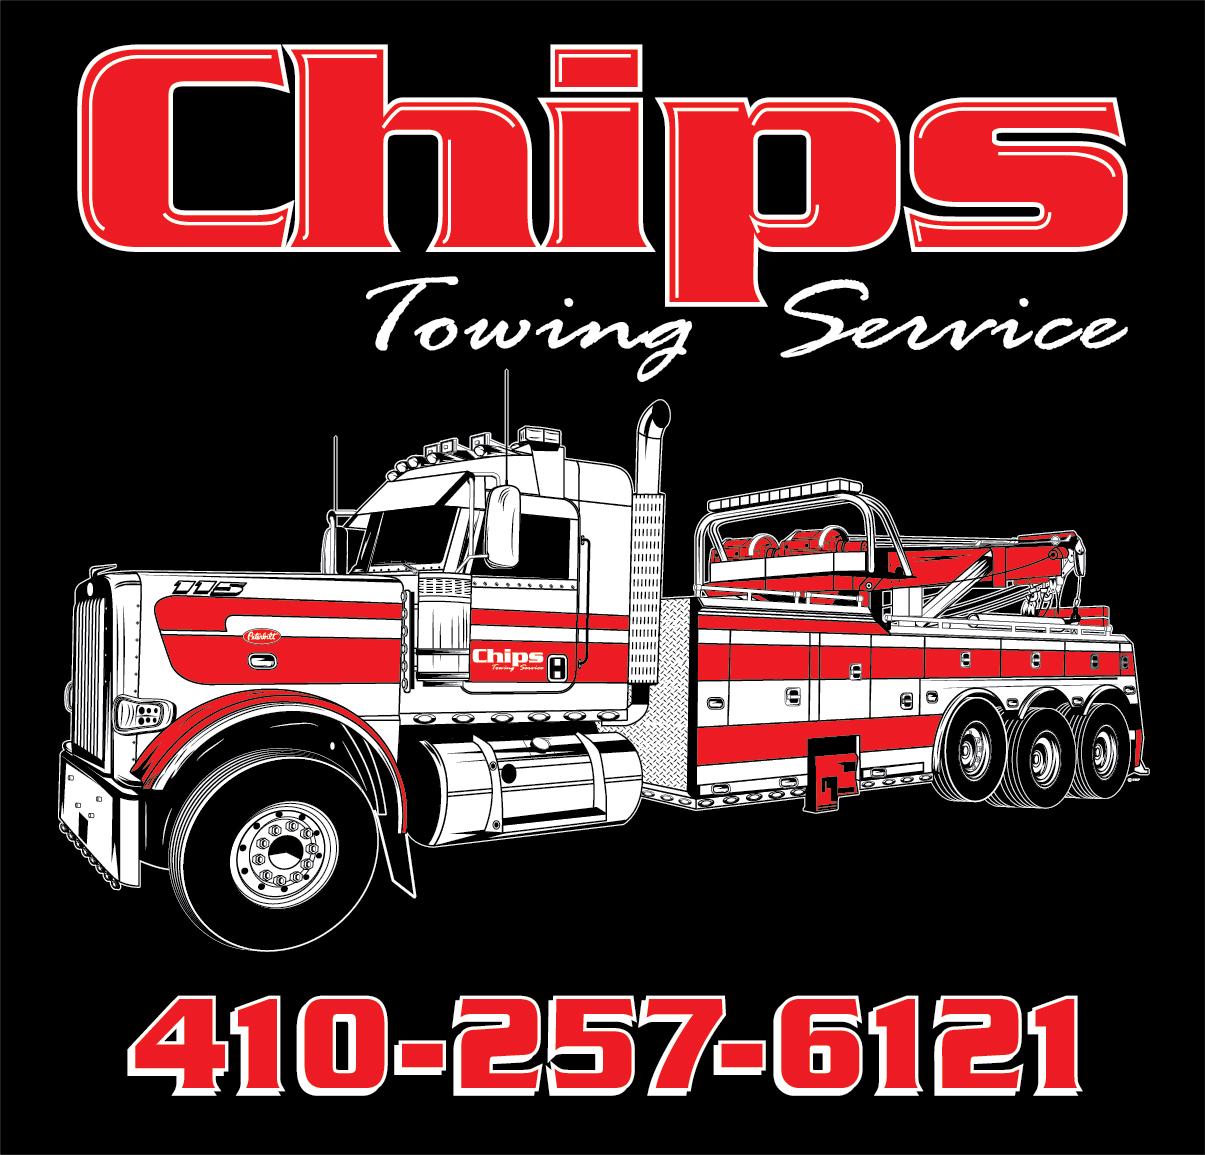 ChipsTowingService.jpg